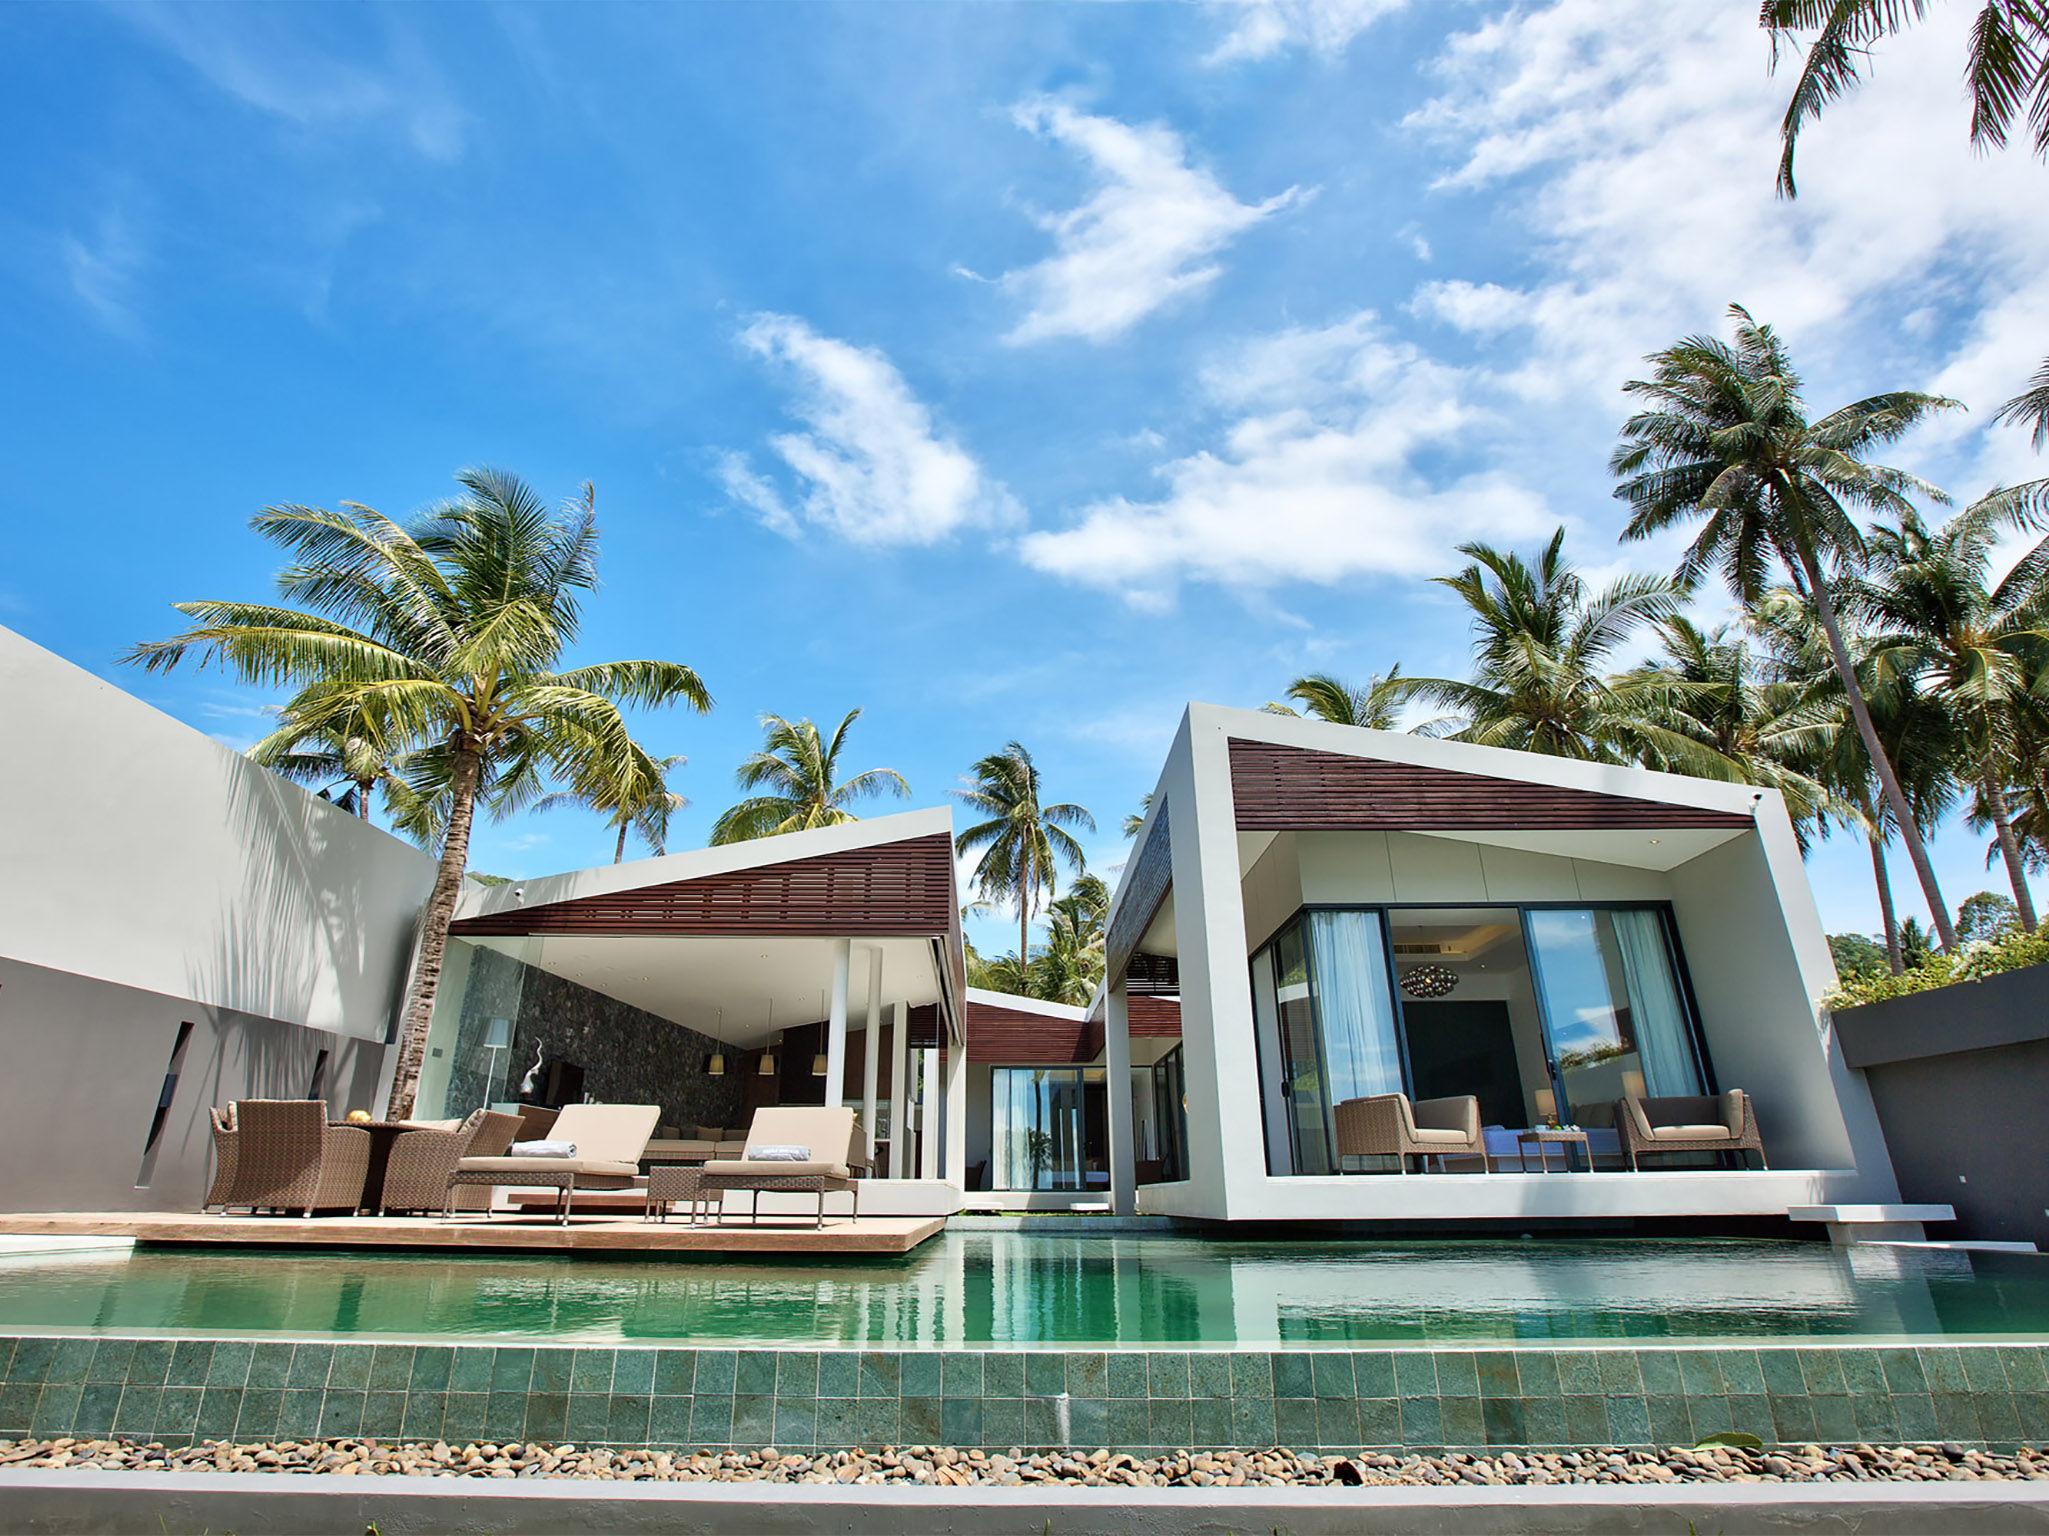 Villa Neung at Mandalay Beach Villas - Stylish villa facade